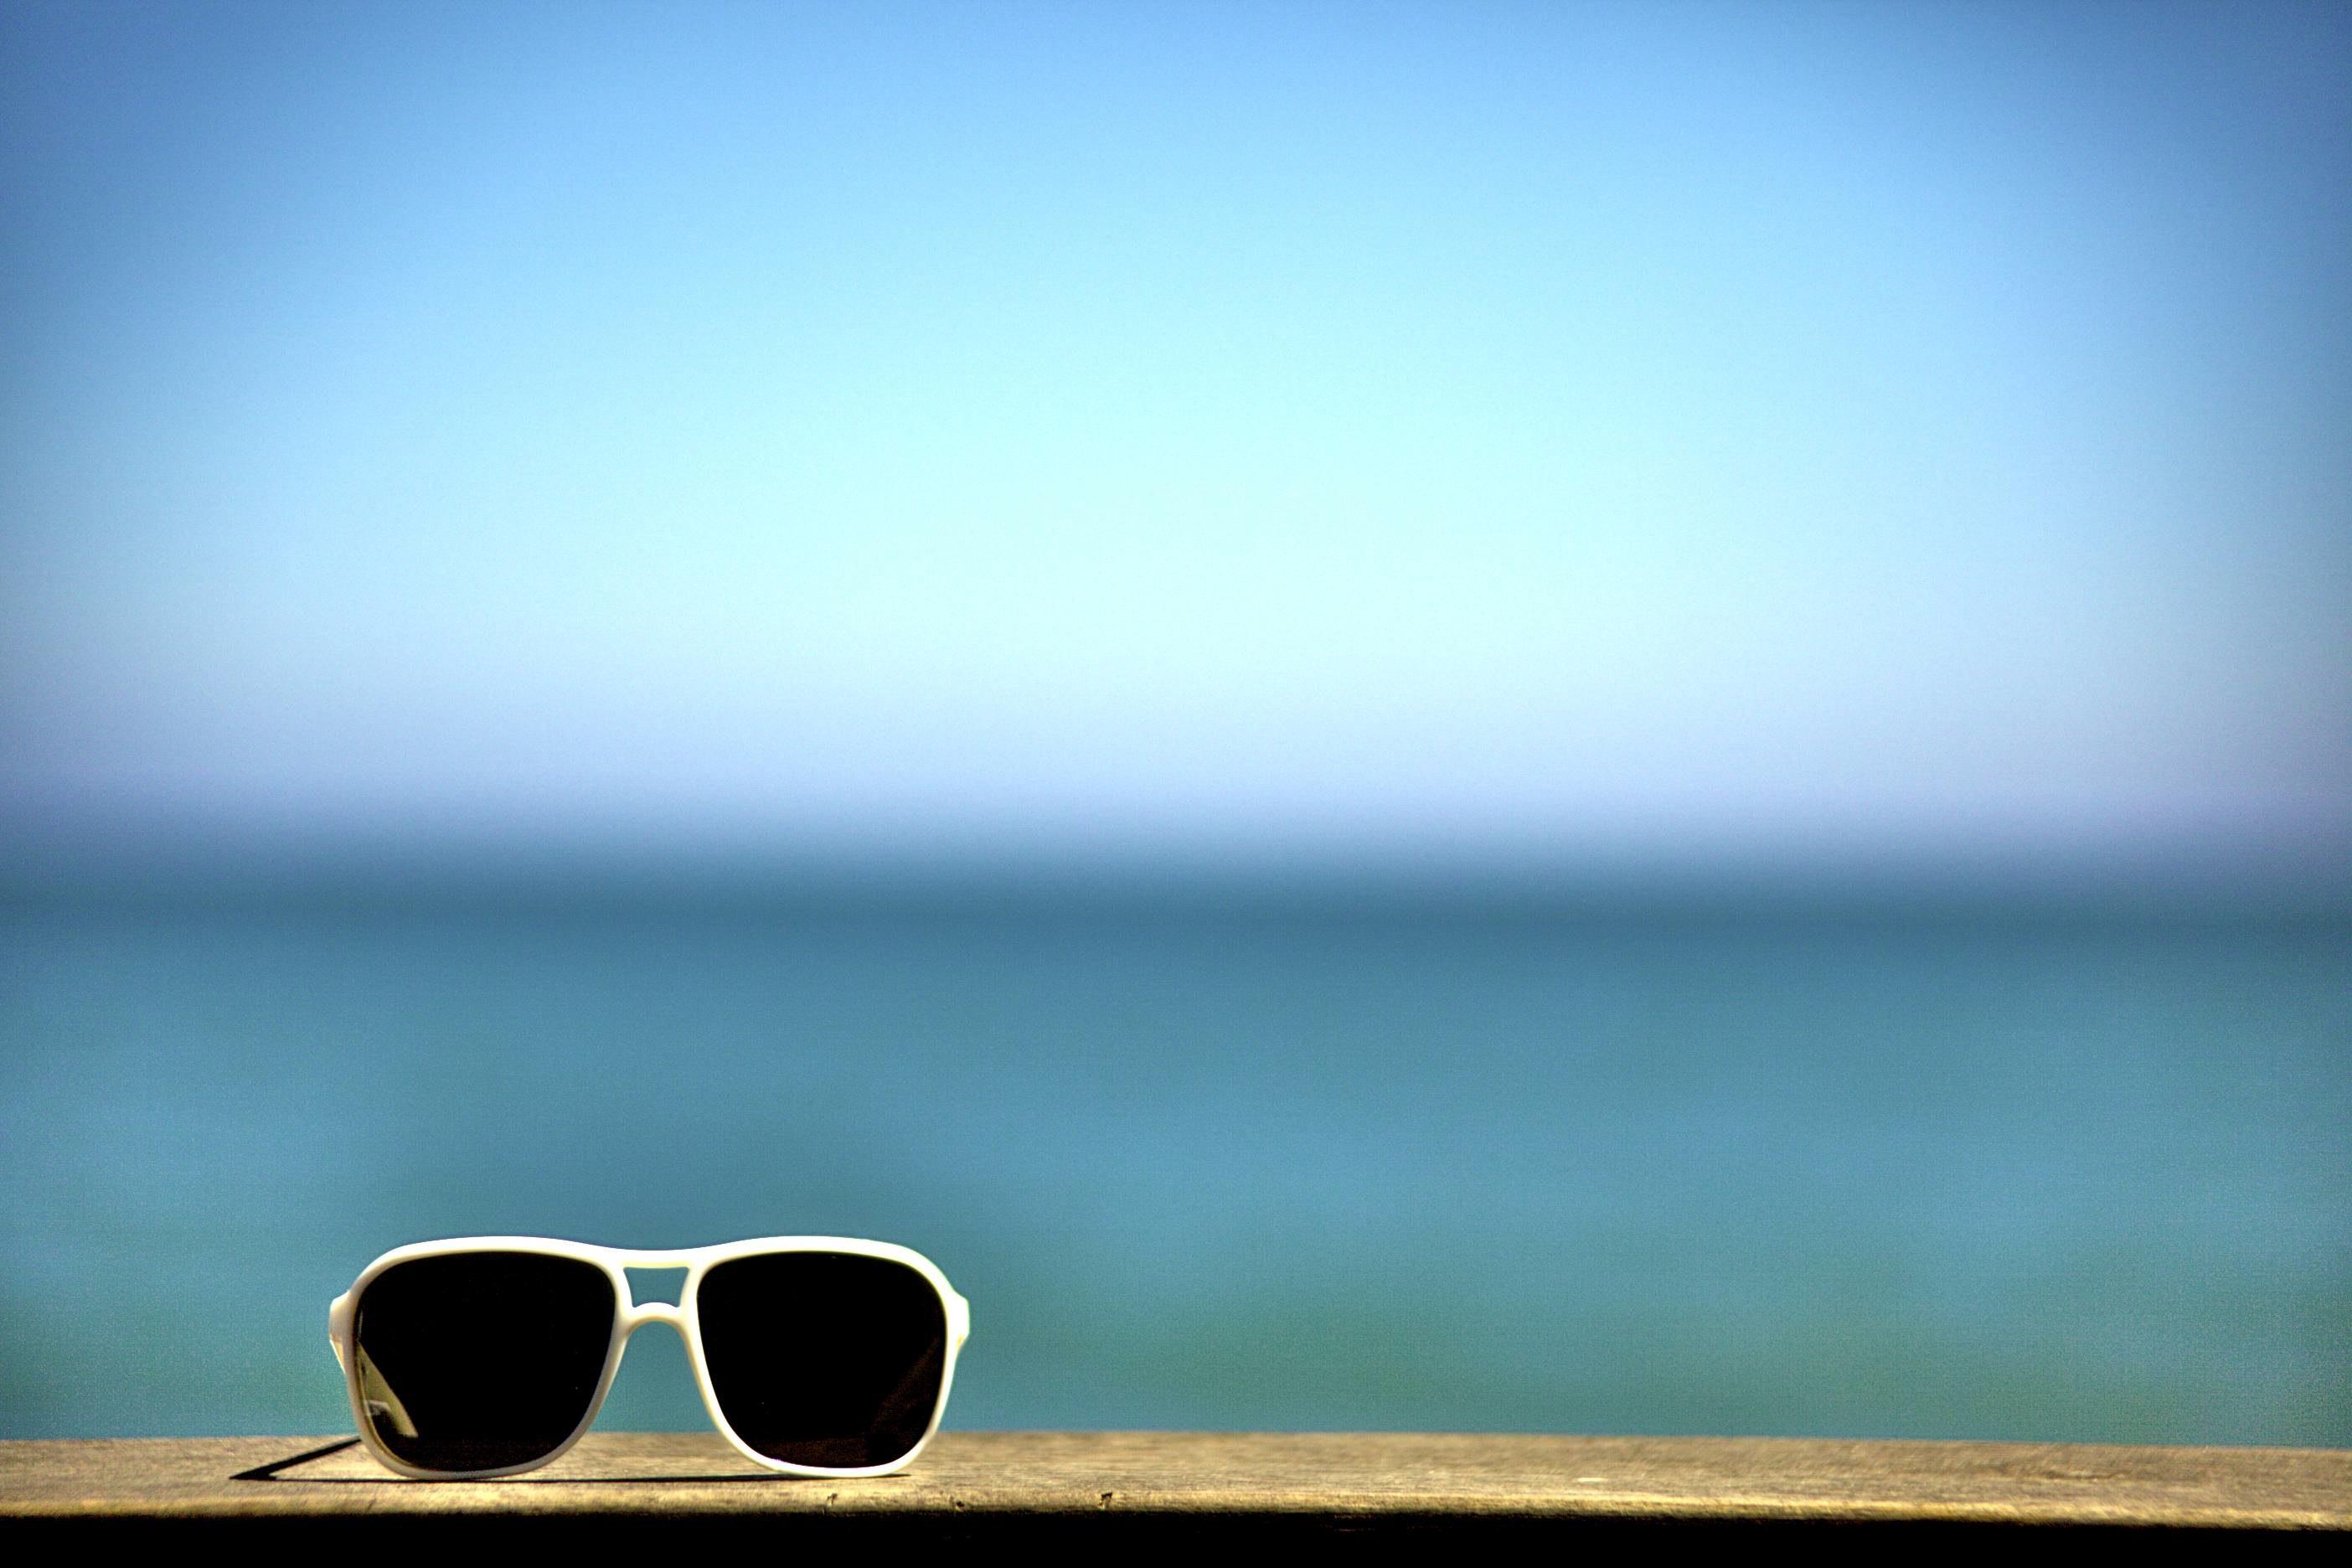 0cc44a6dd4 Summer Style  Best Men s Sunglasses 2017 - Discerning Gent